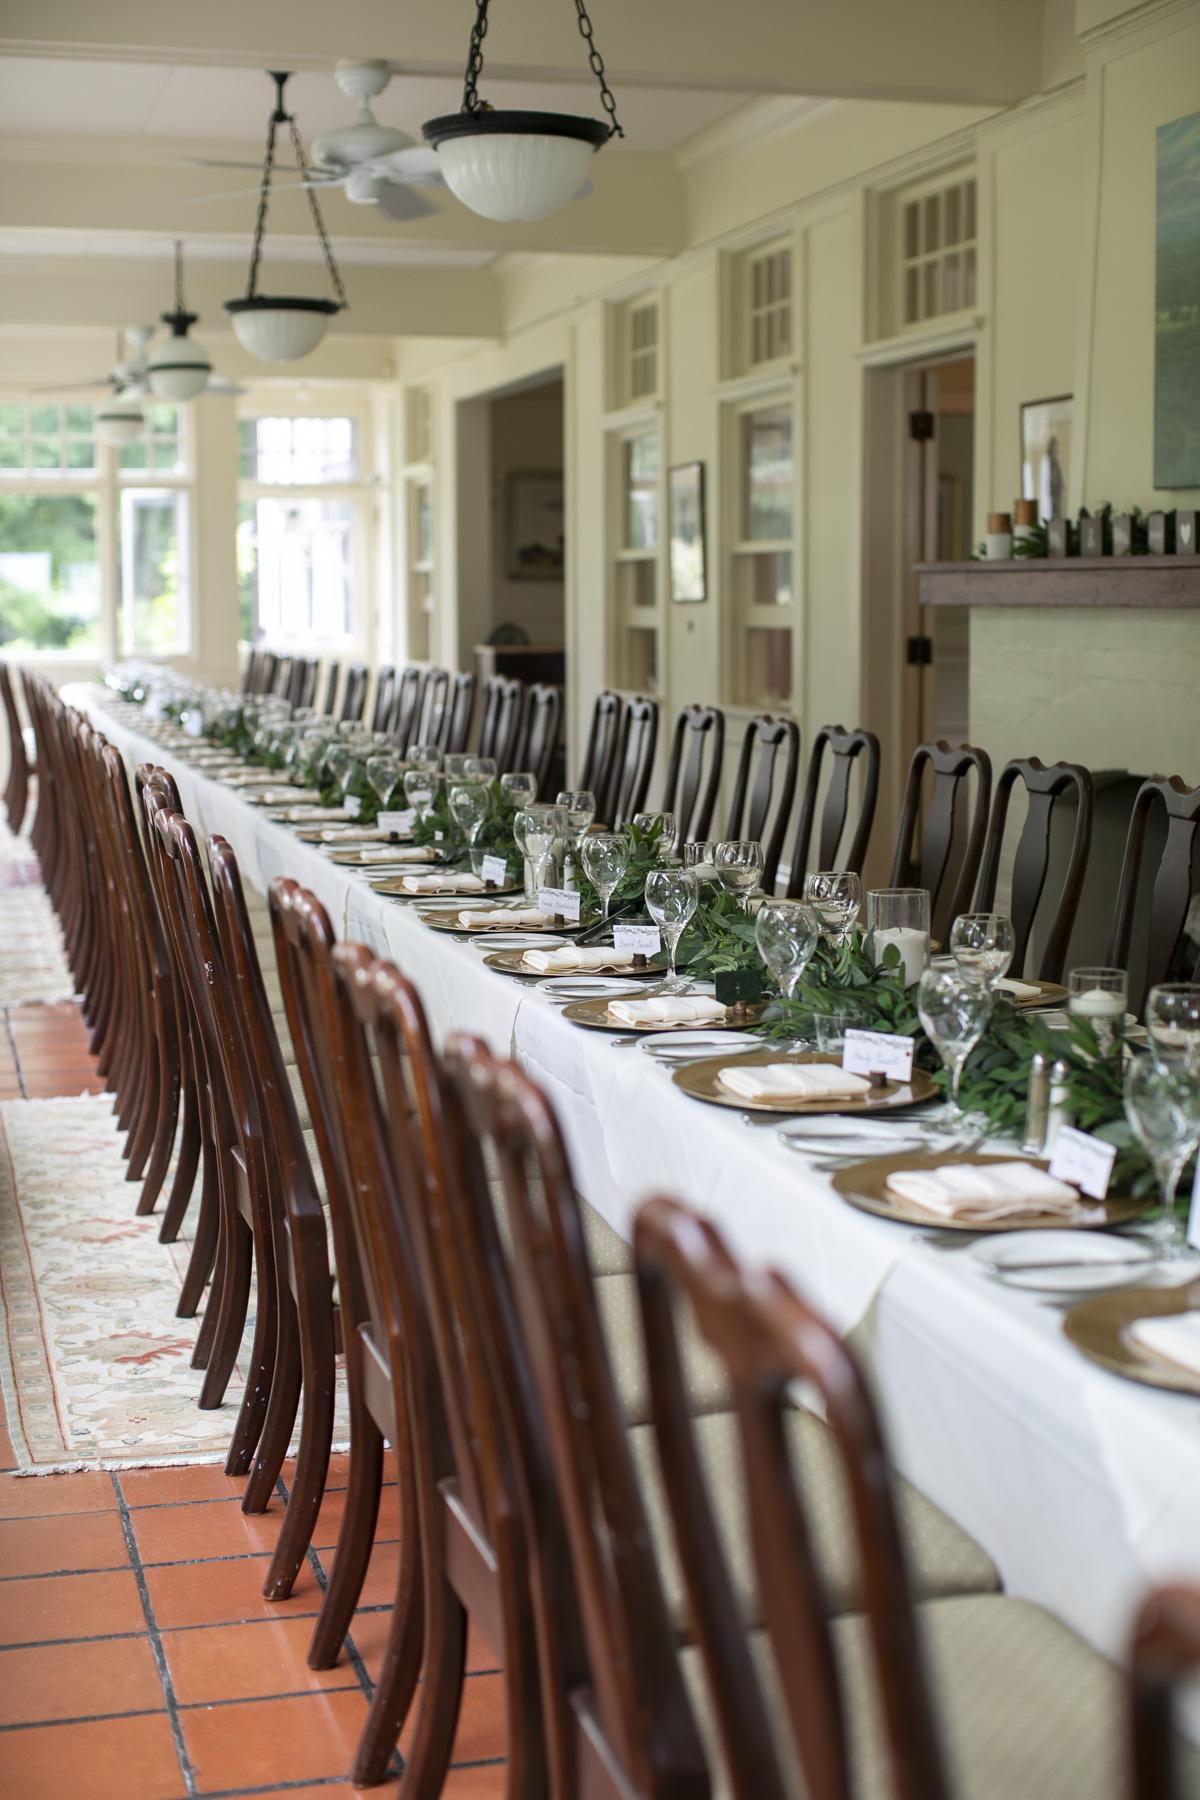 vineyard-bride-philosophy-studios-outdoor-summer-wedding-the-tamahaac-club-niagara-ancaster-toronto-vendor-0012.JPG